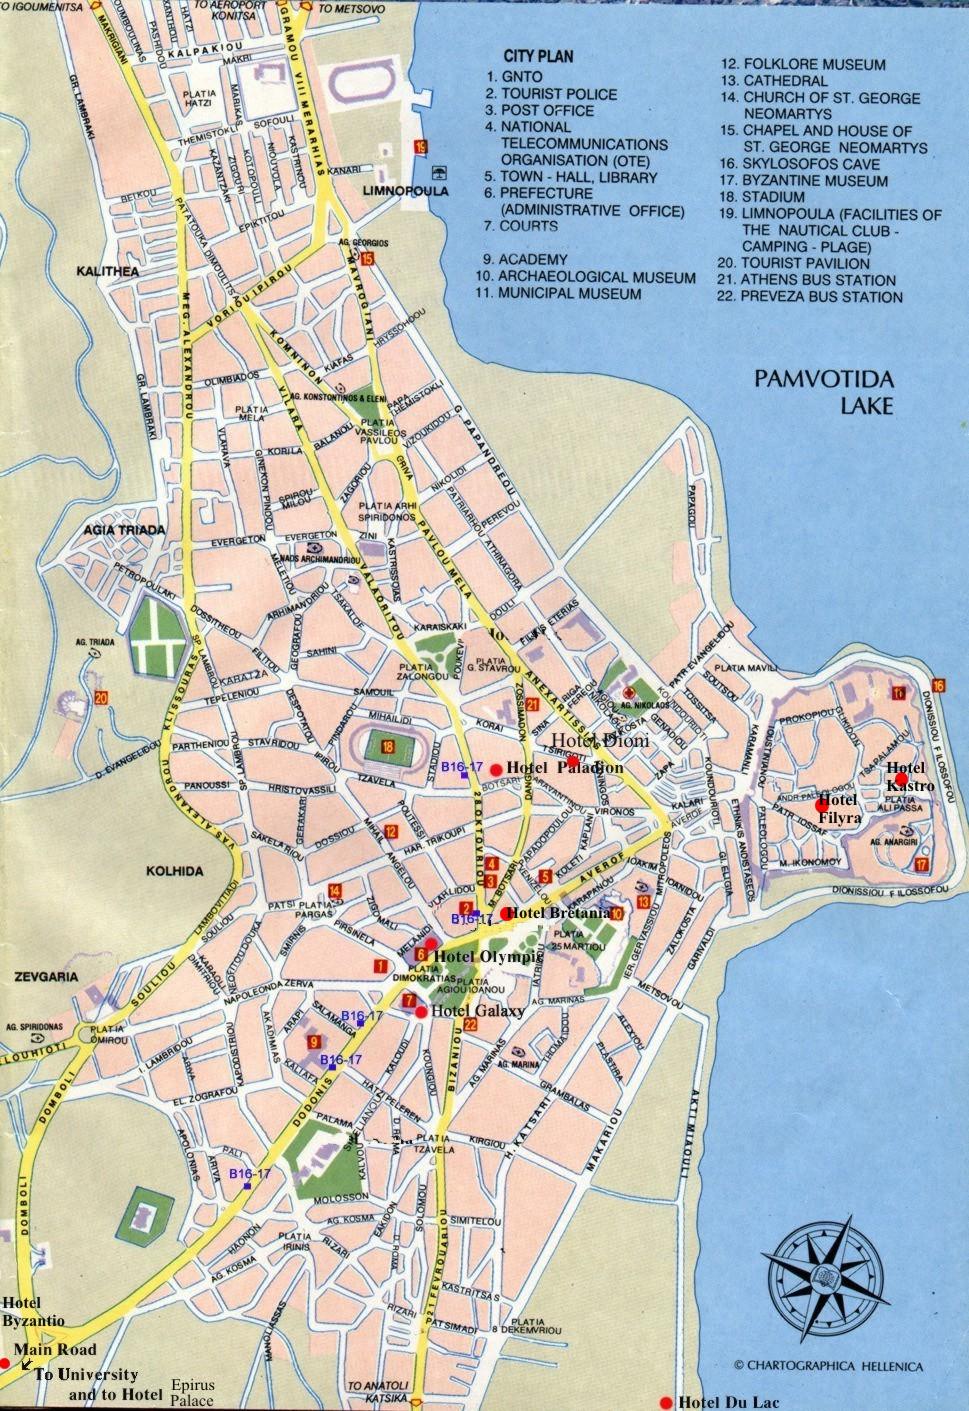 Ioanninacitymapjpg